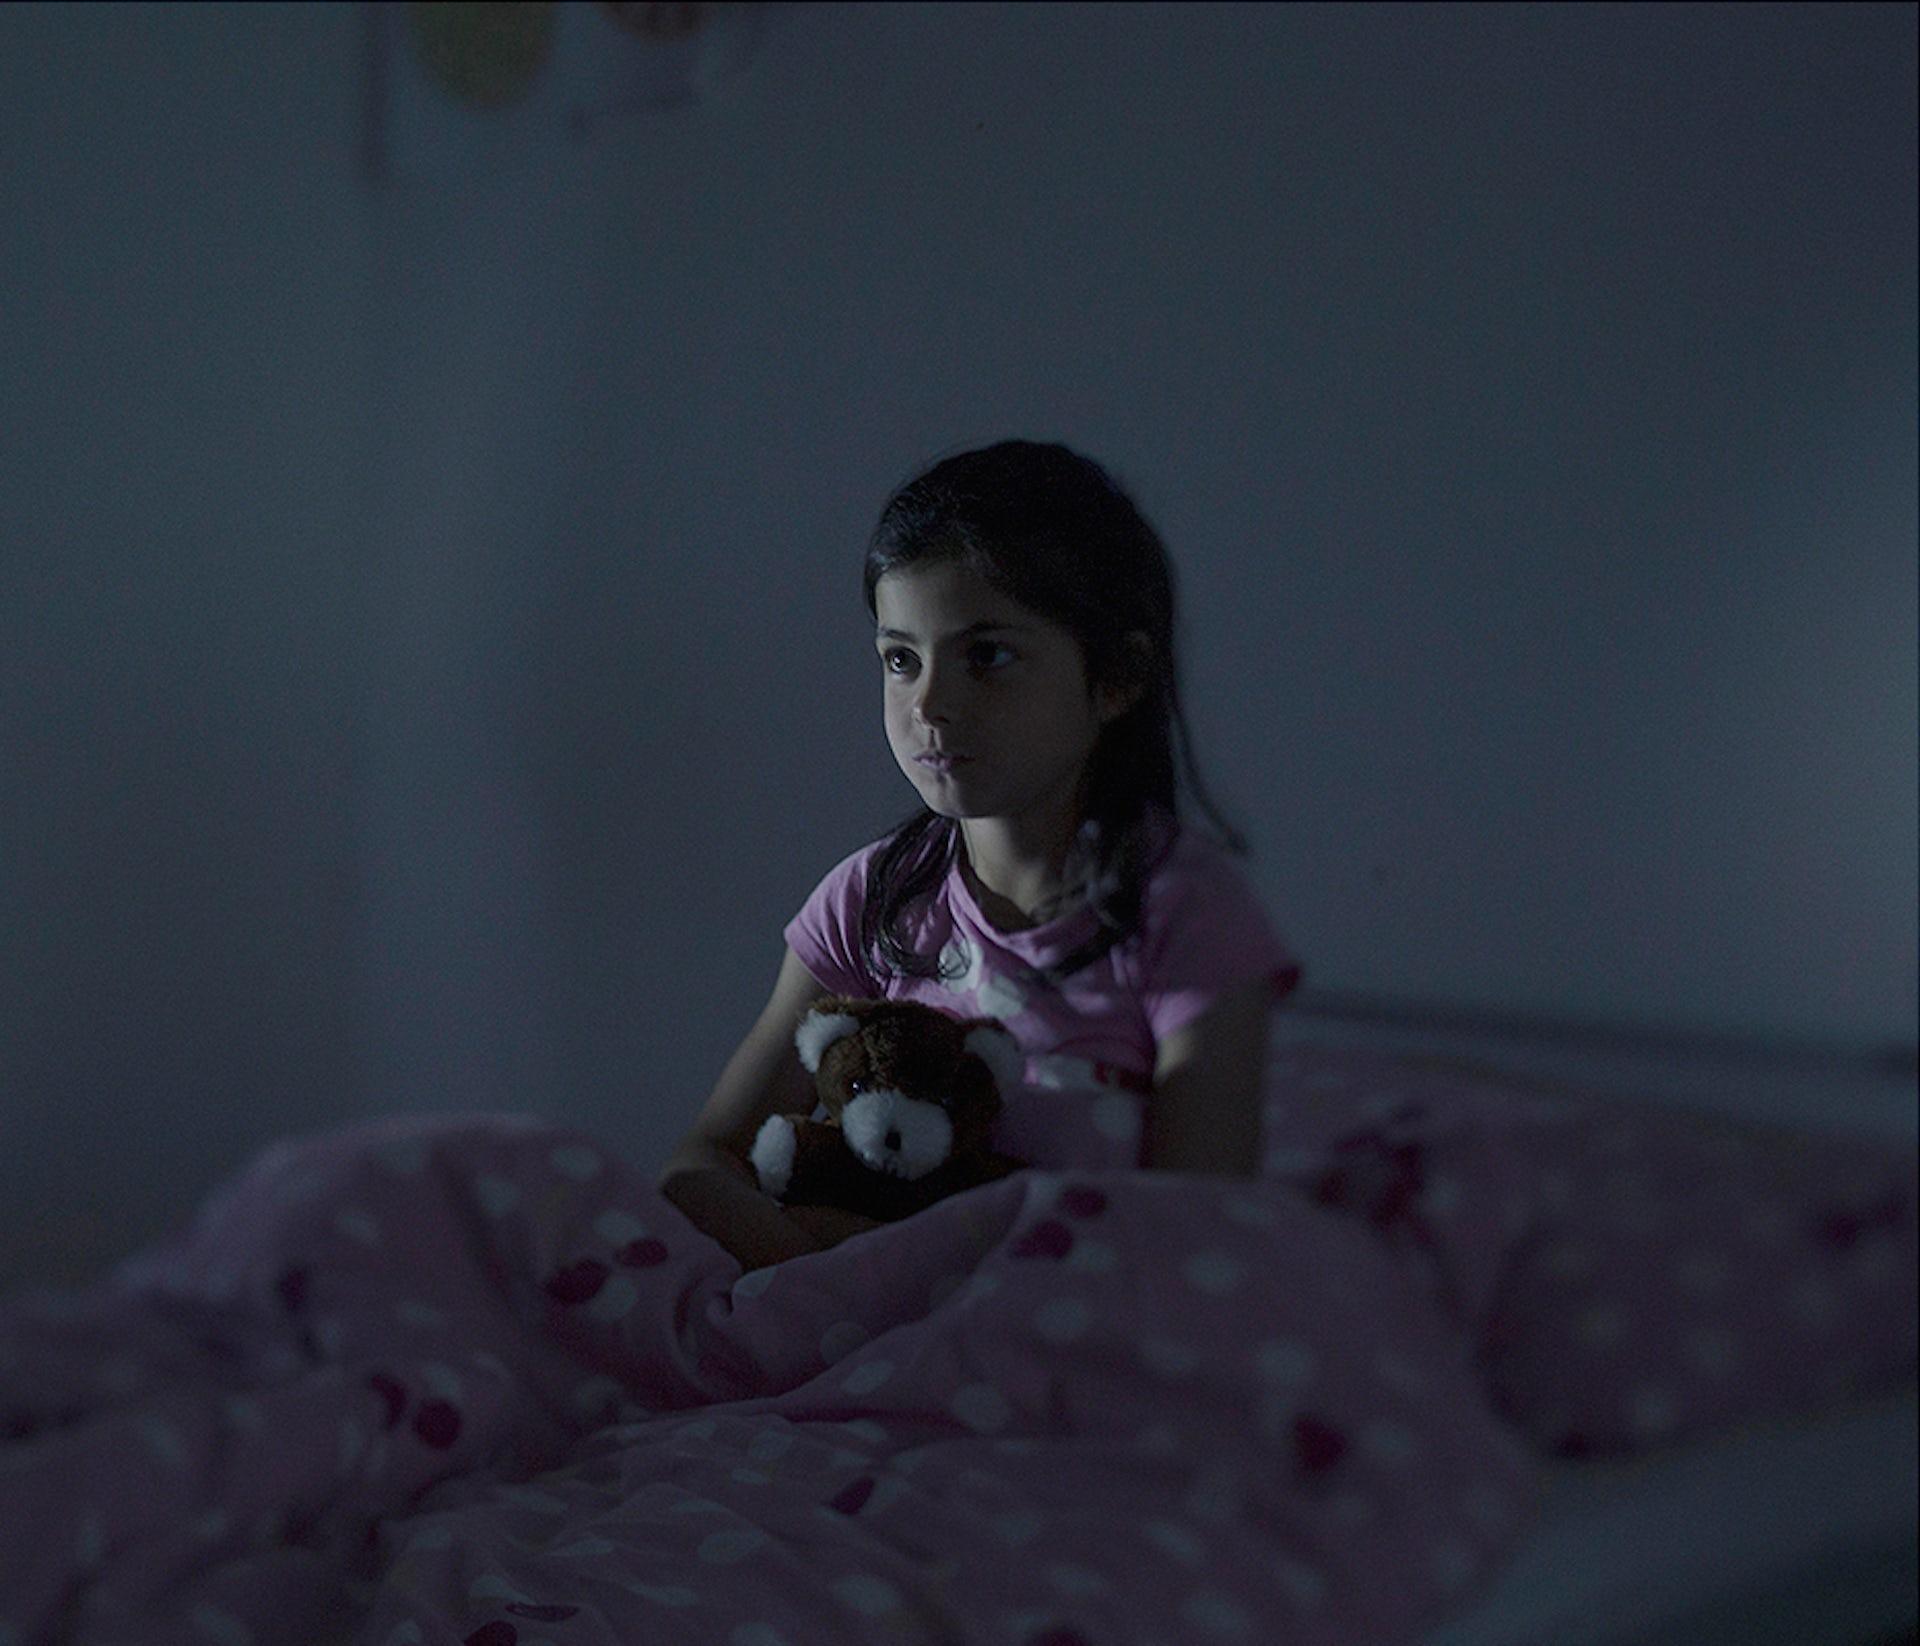 Children educate teachers with their testimonies from war zones